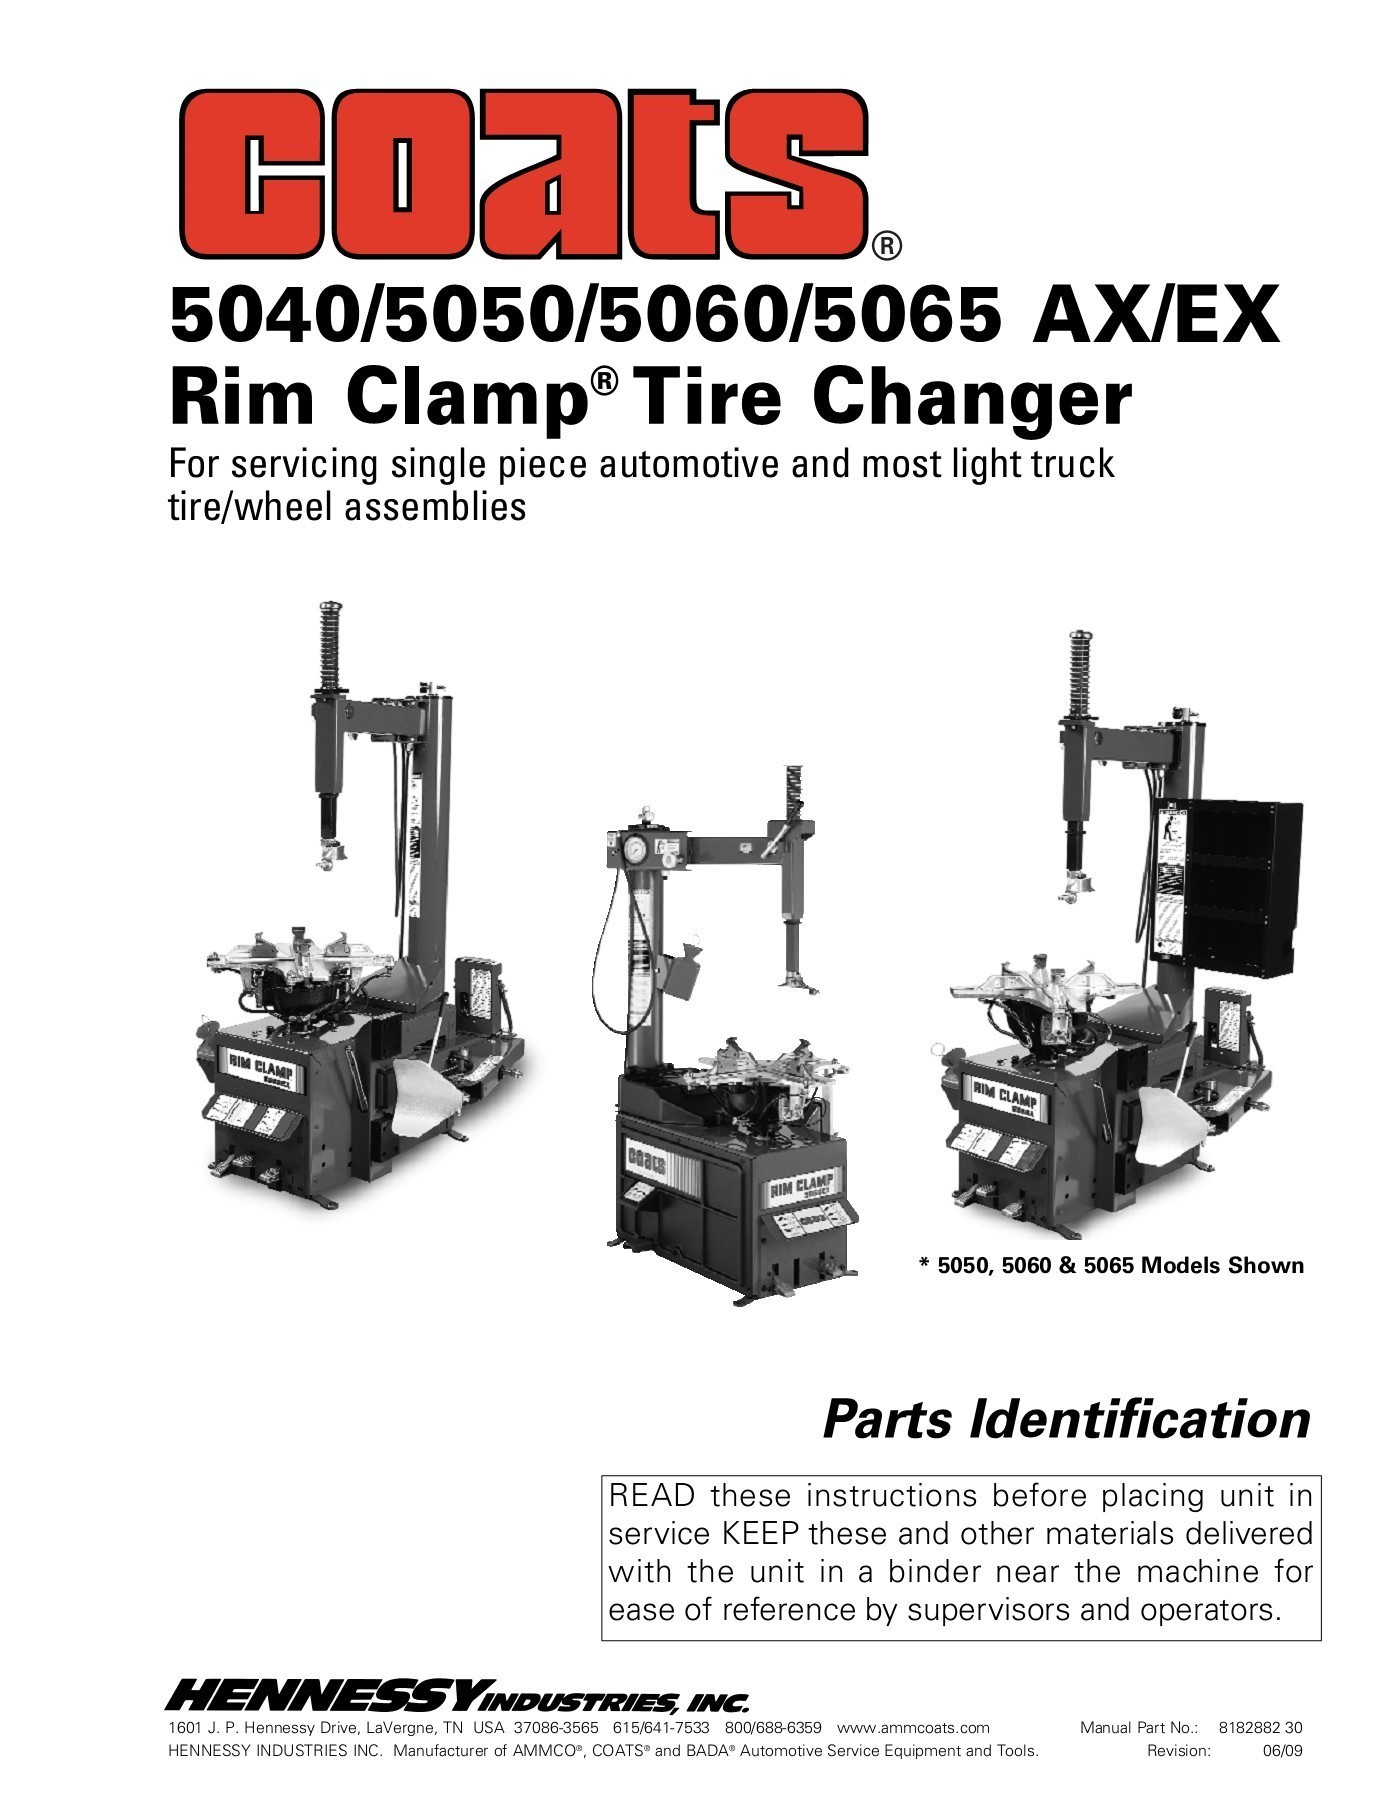 Coats 5060 Wireing Schematic Coats Tire Machine Parts Diagram